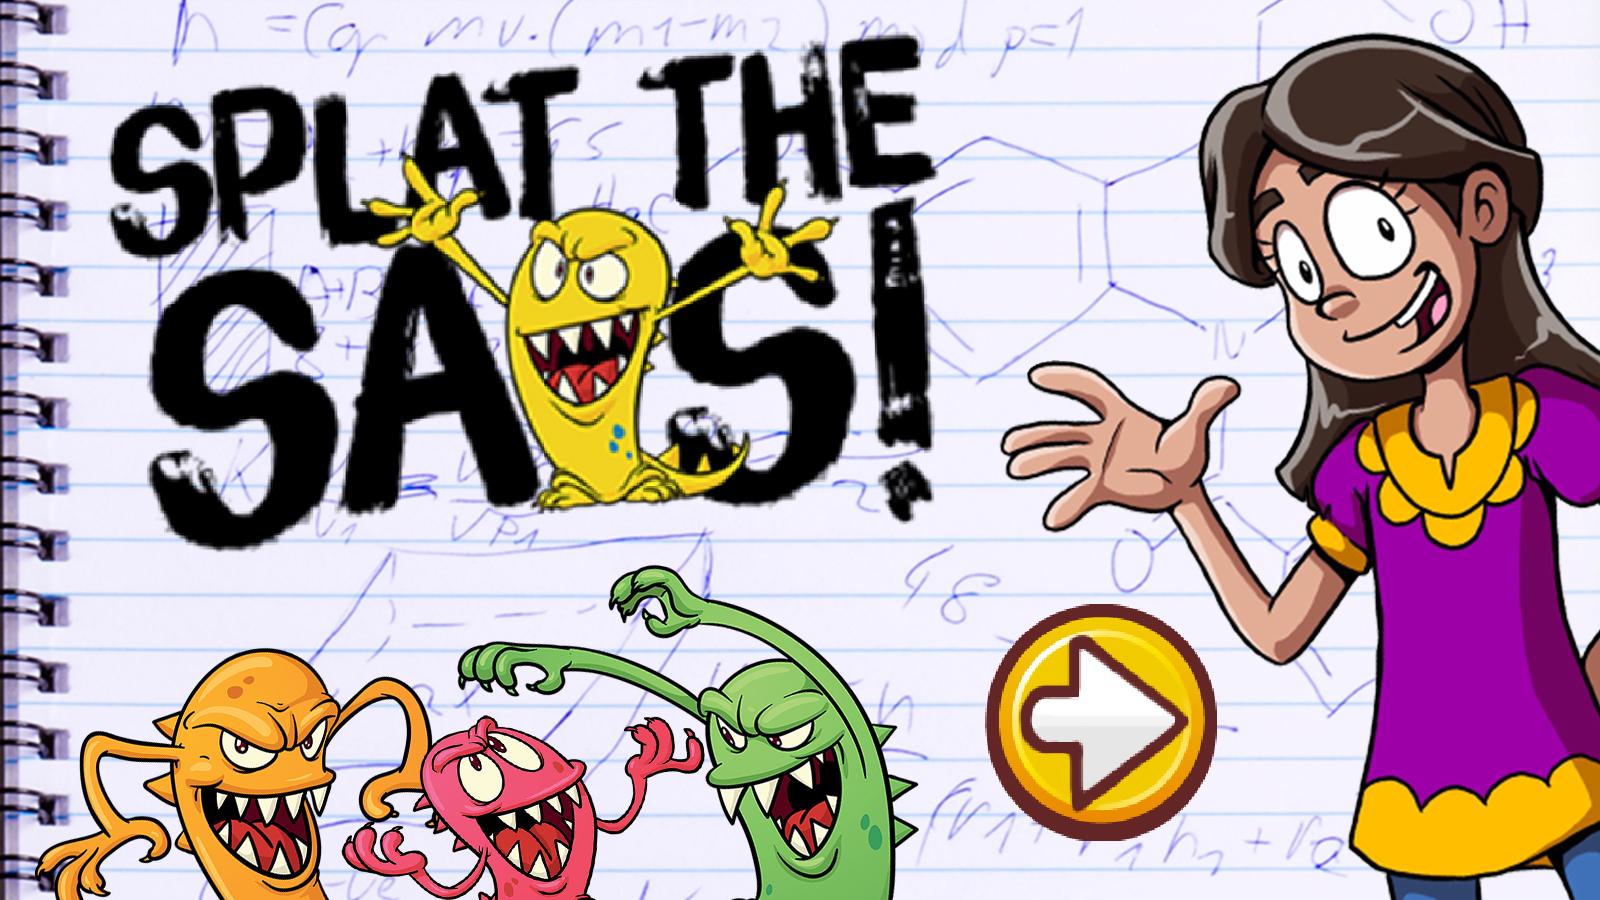 Splat the SATs!